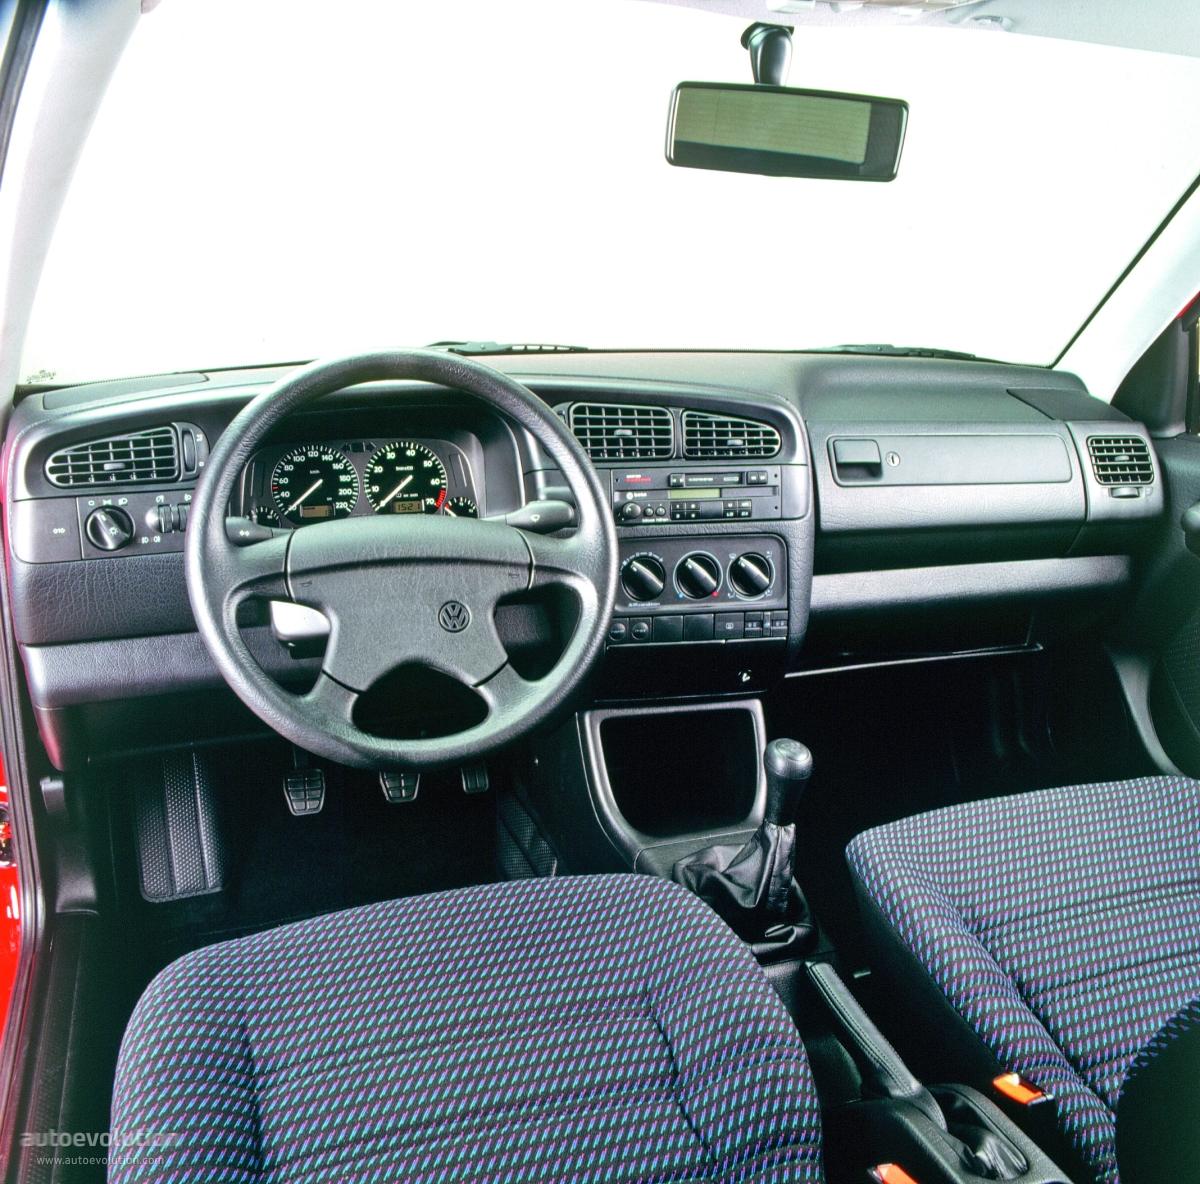 Volkswagen Vento Jetta Specs Photos 1992 1993 1994 1995 1996 Vr6 Engine Diagram 1998